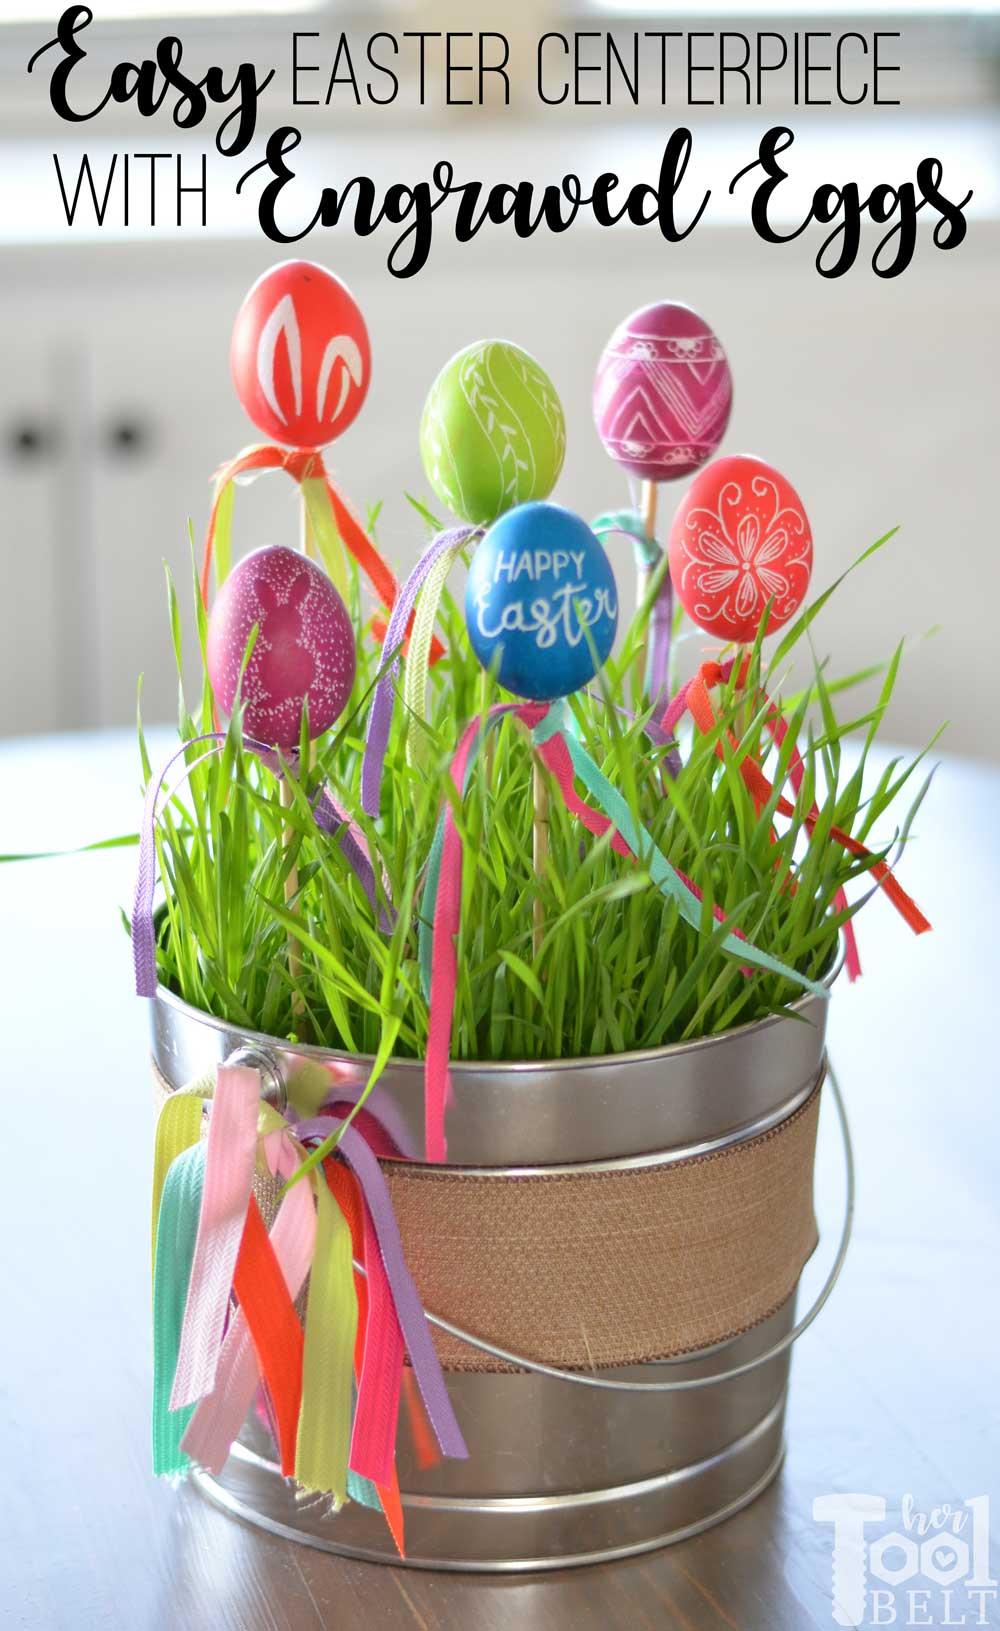 Easter Egg Decor With Engraved Eggs Her Tool Belt